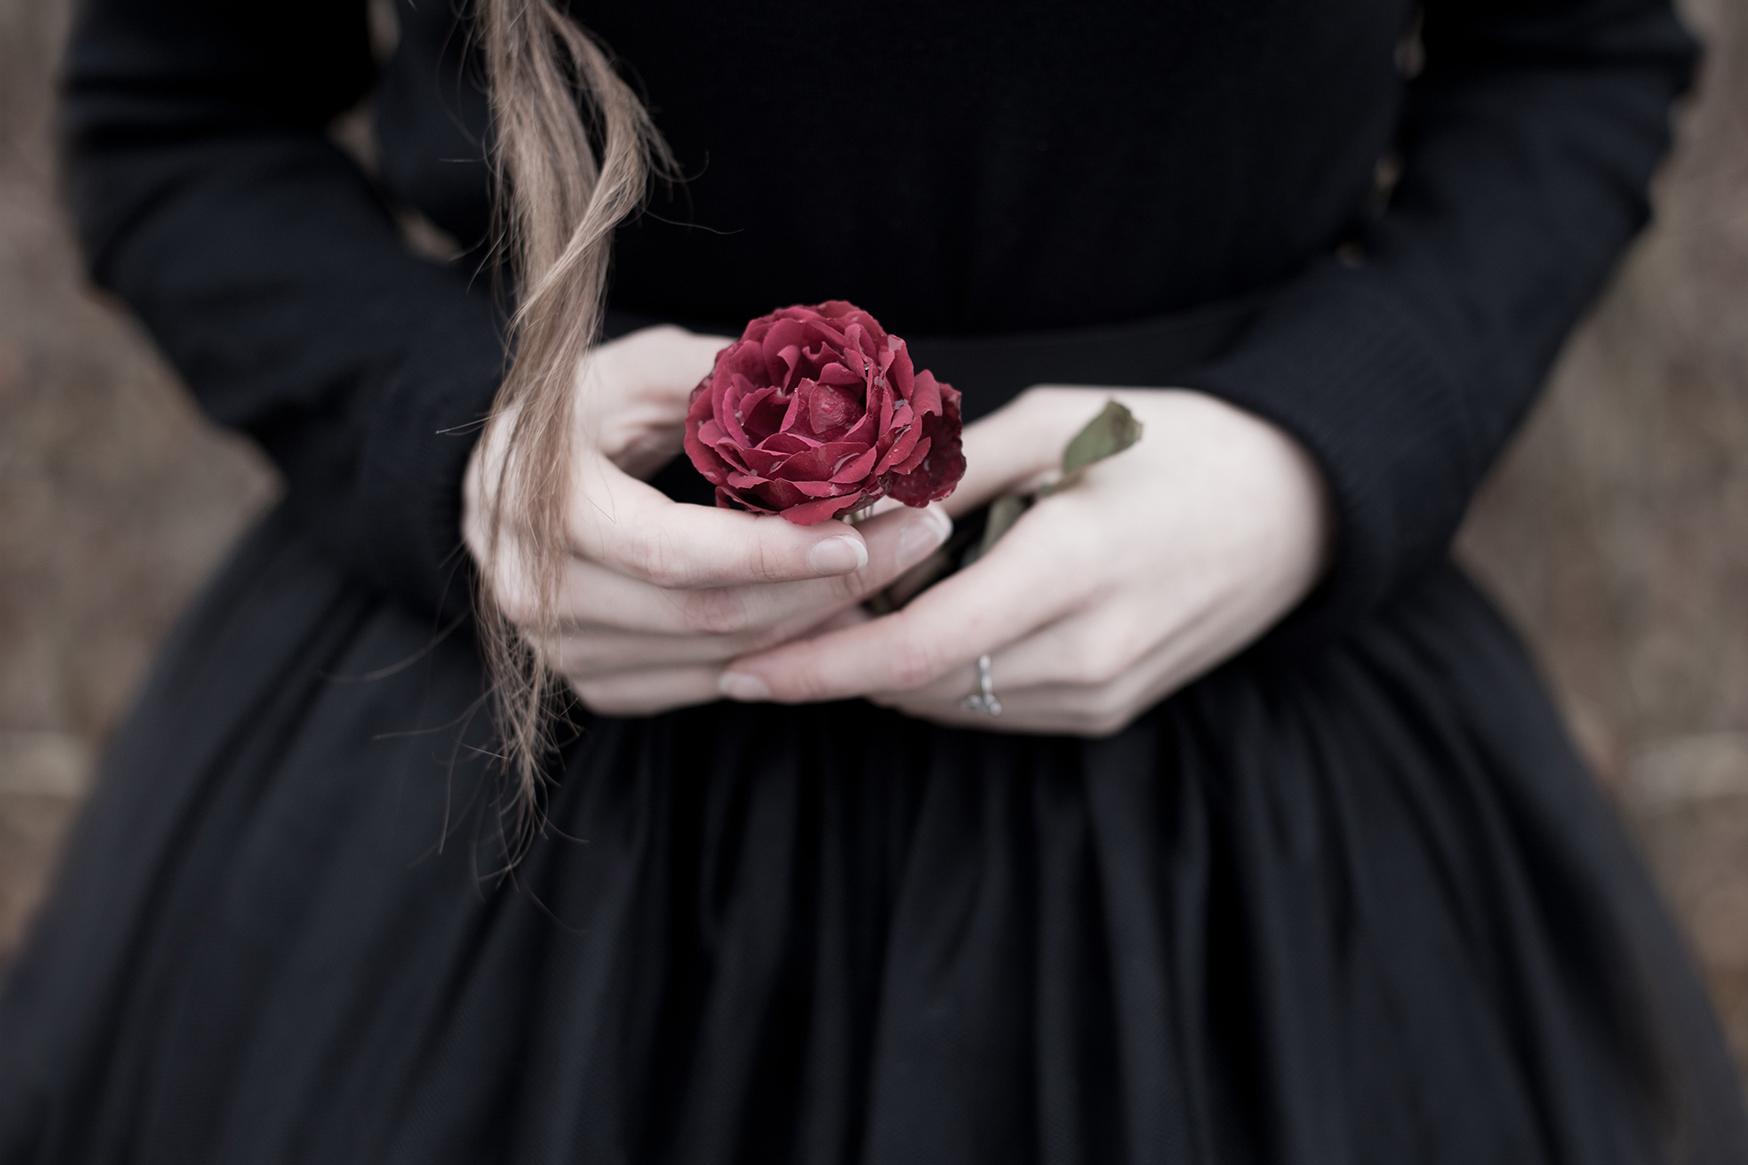 региона картинка на аву роза в руке кто